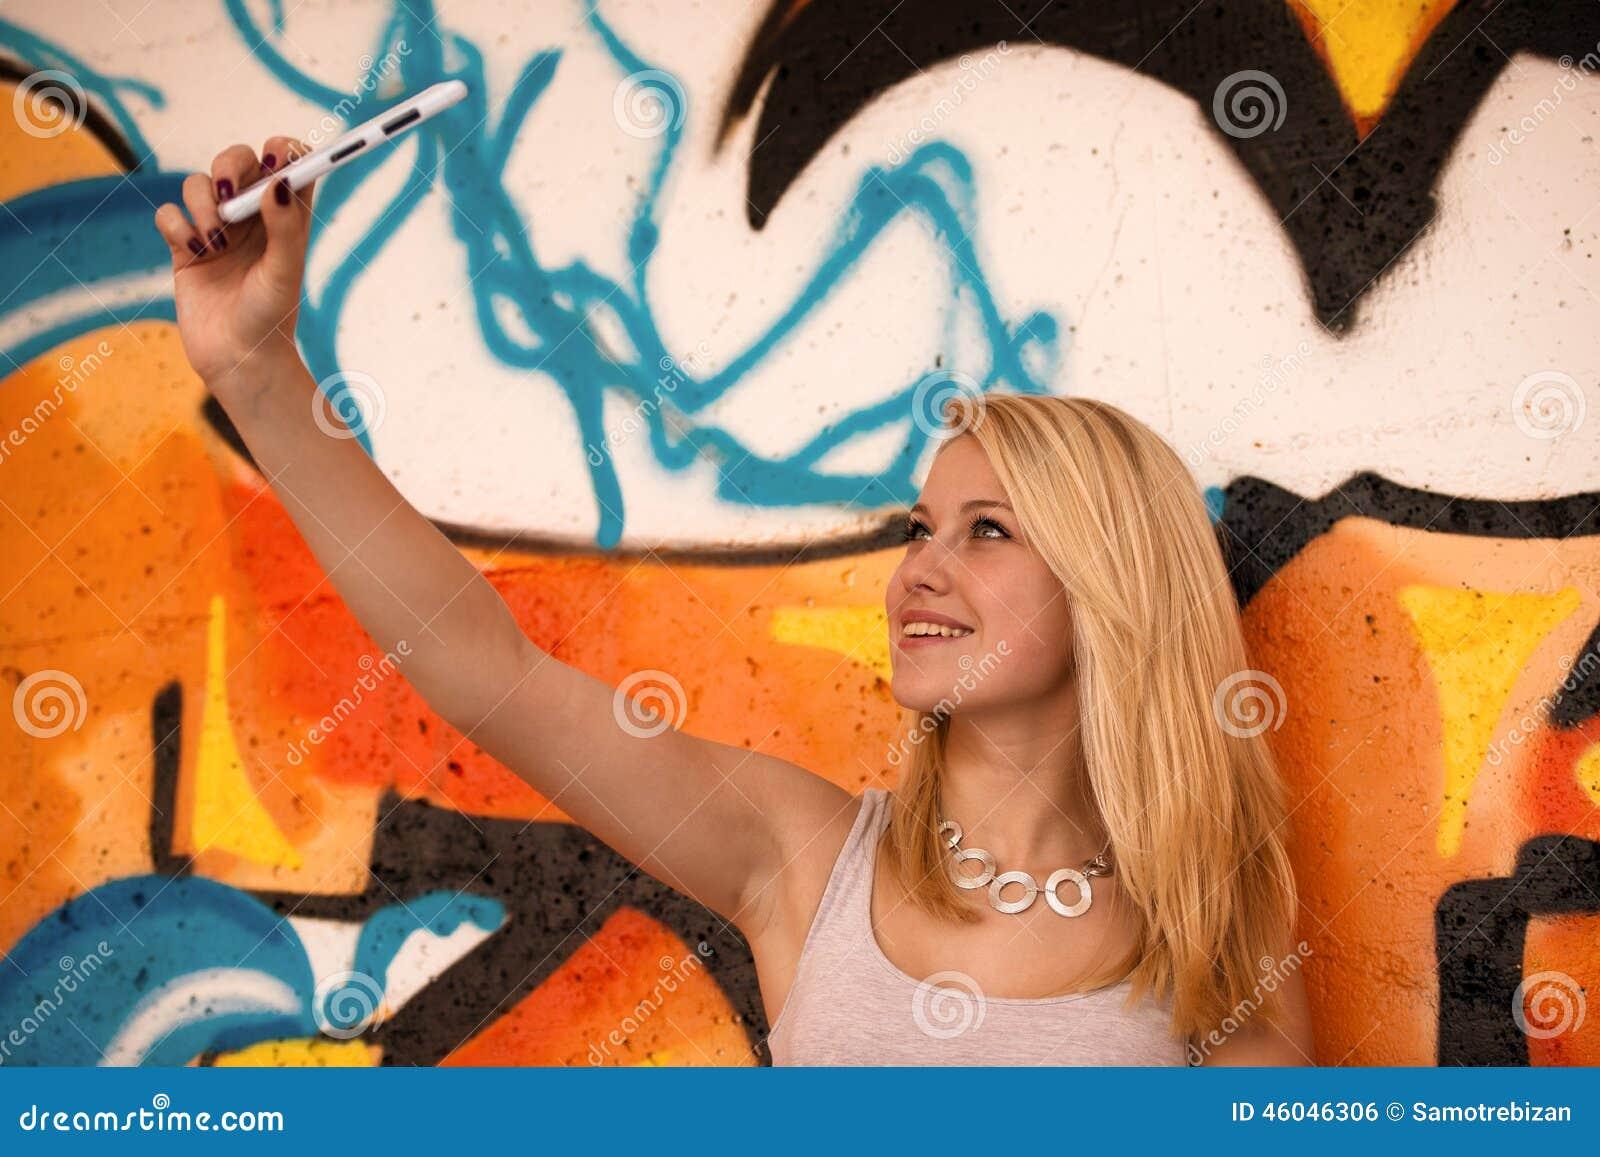 Piękna młoda kobieta robi selfie wal outdoors blisko graffiti